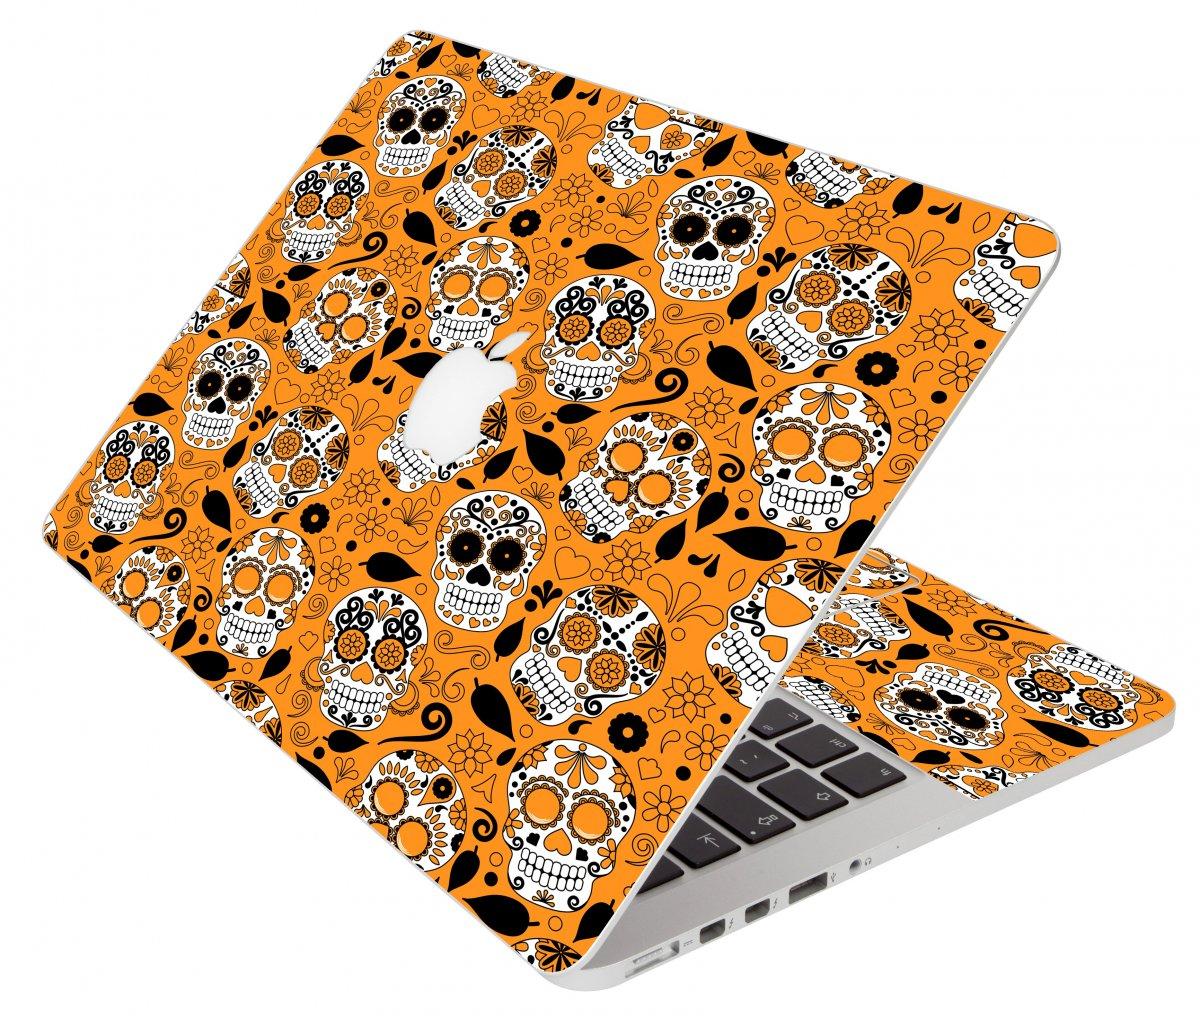 Orange Sugar Skull Apple Macbook Air 13 A1466 Laptop  Skin